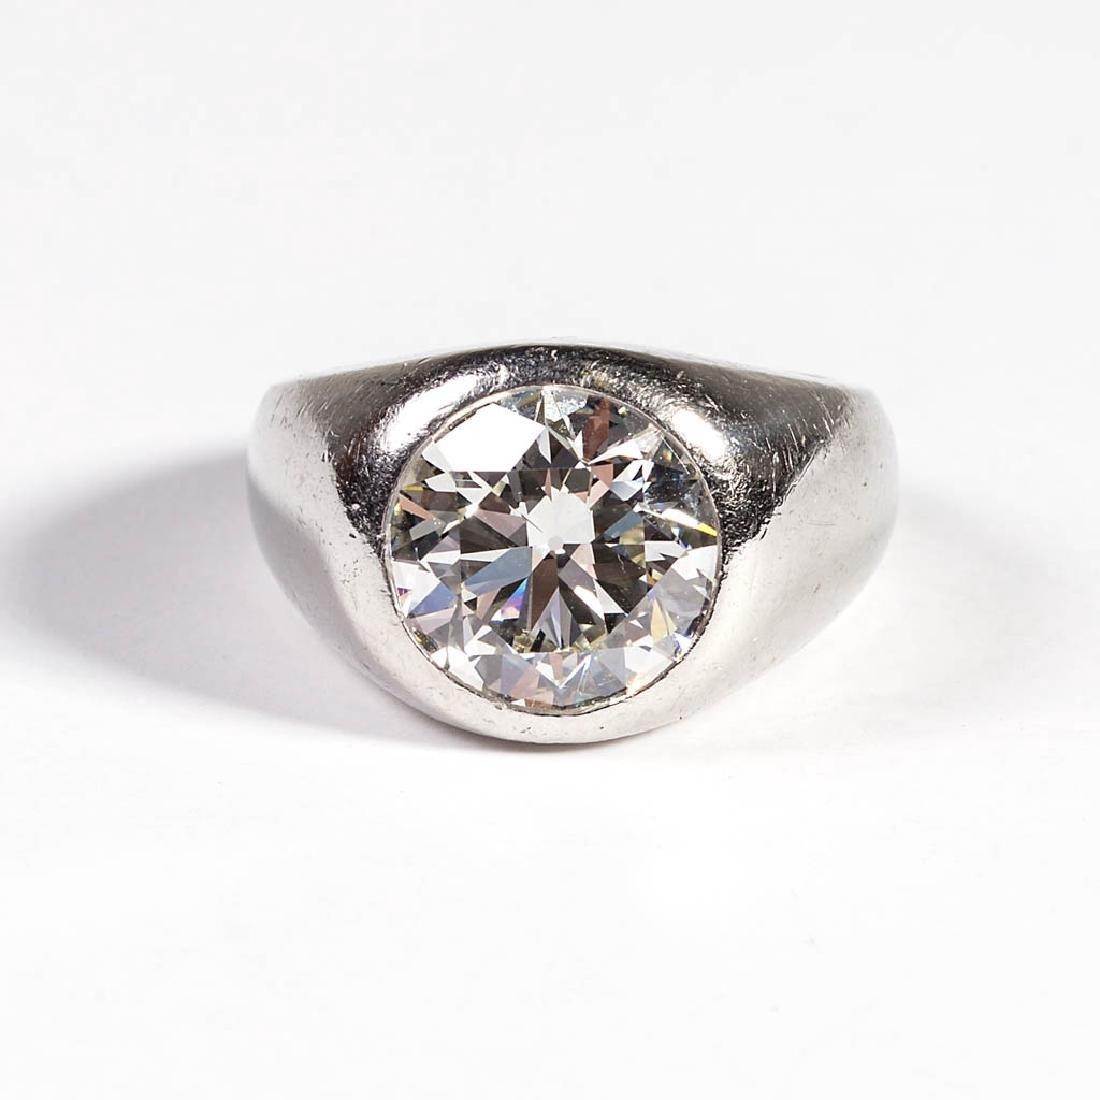 VINTAGE PLATINUM AND 5 CARAT DIAMOND